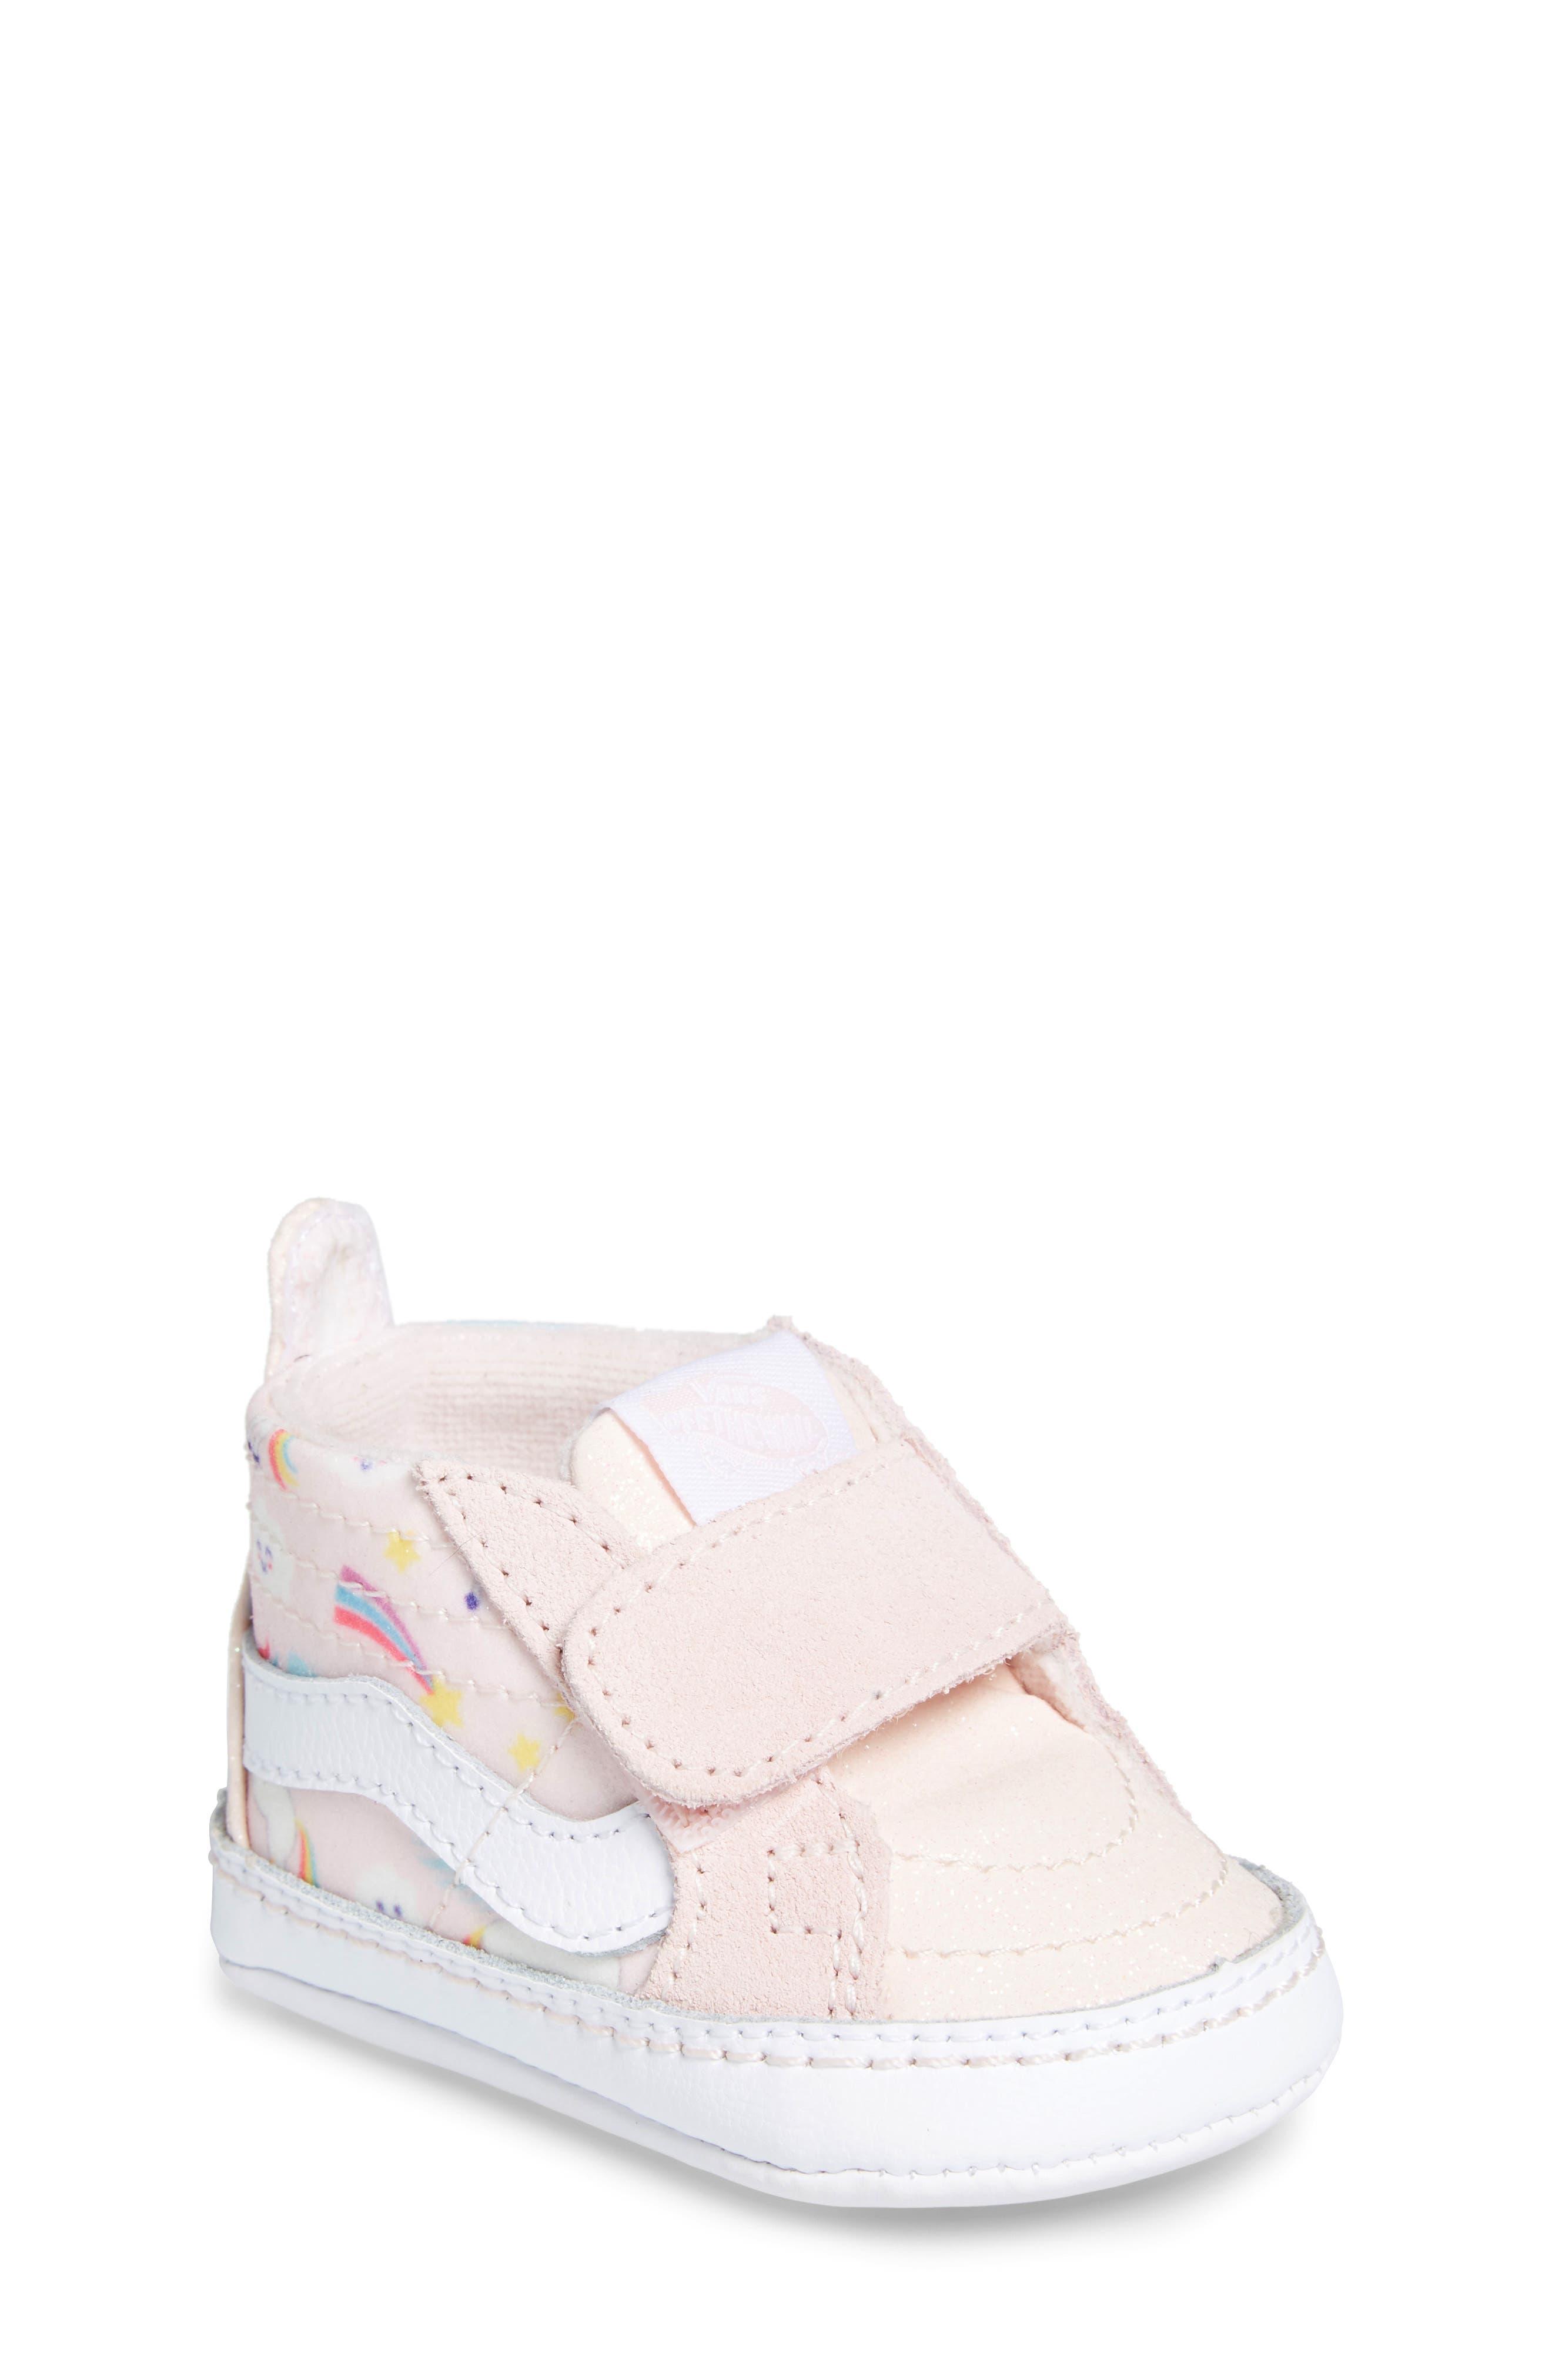 'SK8-Hi' Crib Sneaker,                         Main,                         color, GLITTER PEGASUS PINK/ WHITE